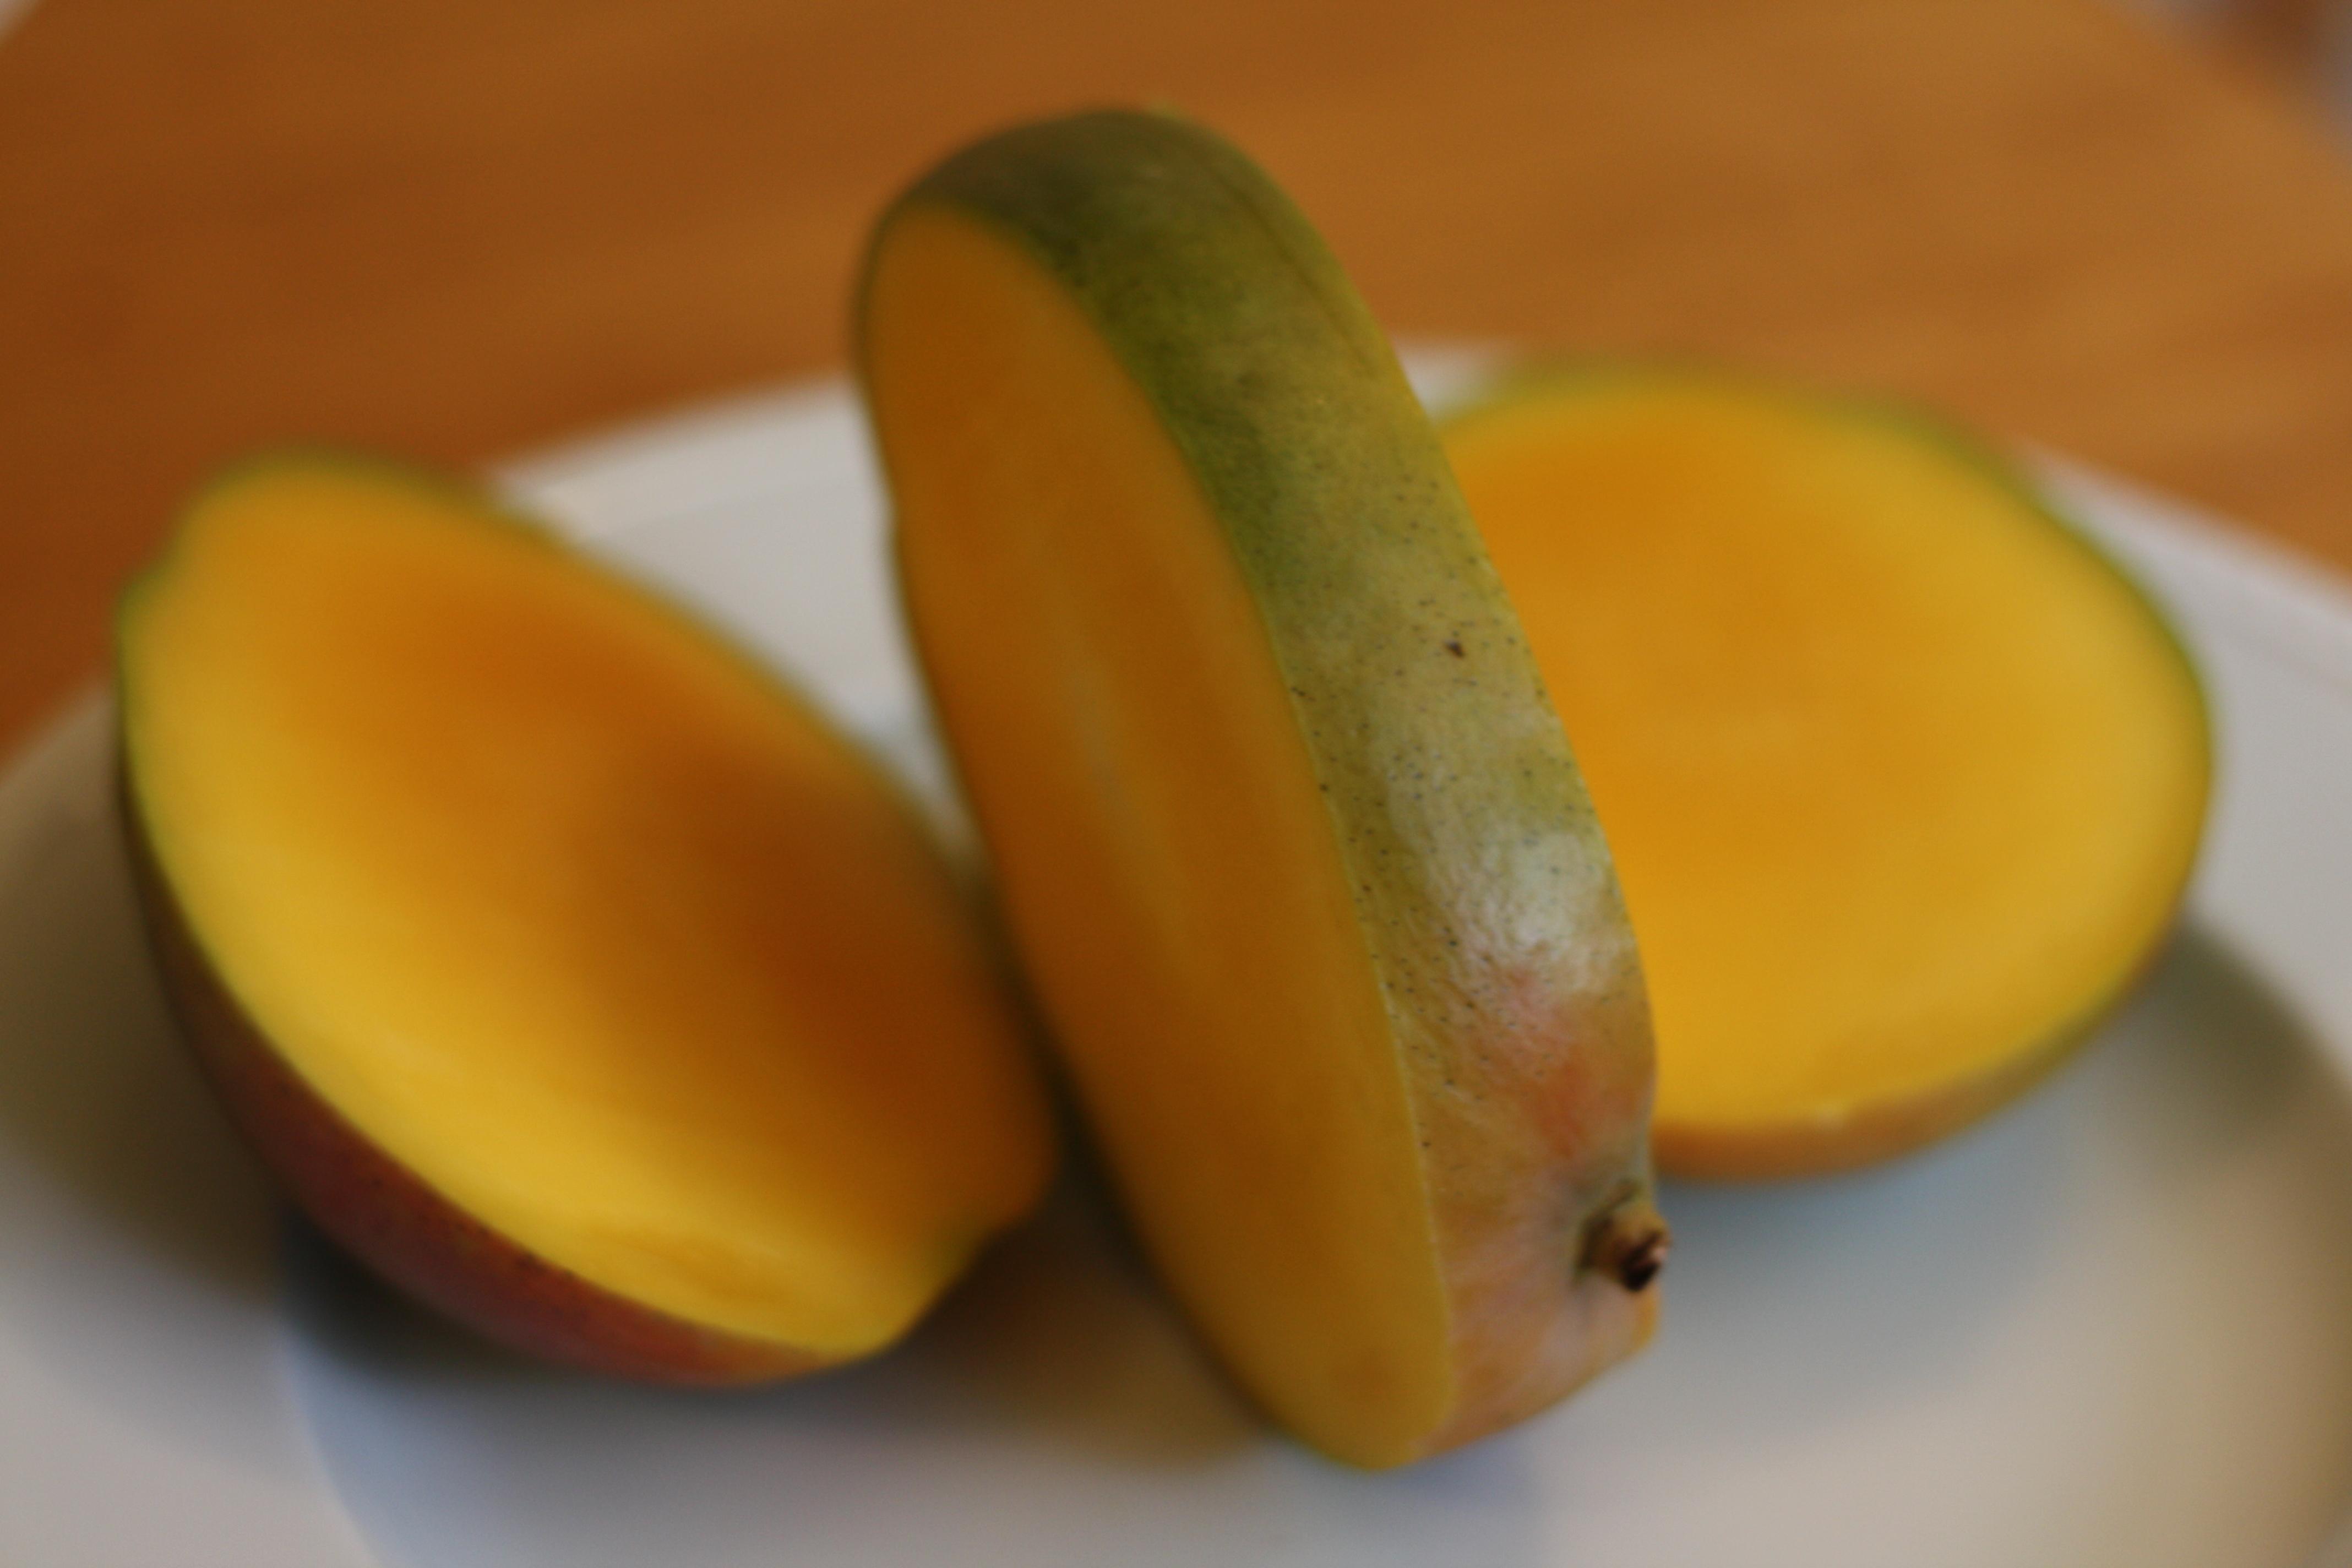 What a ripe mango looks like